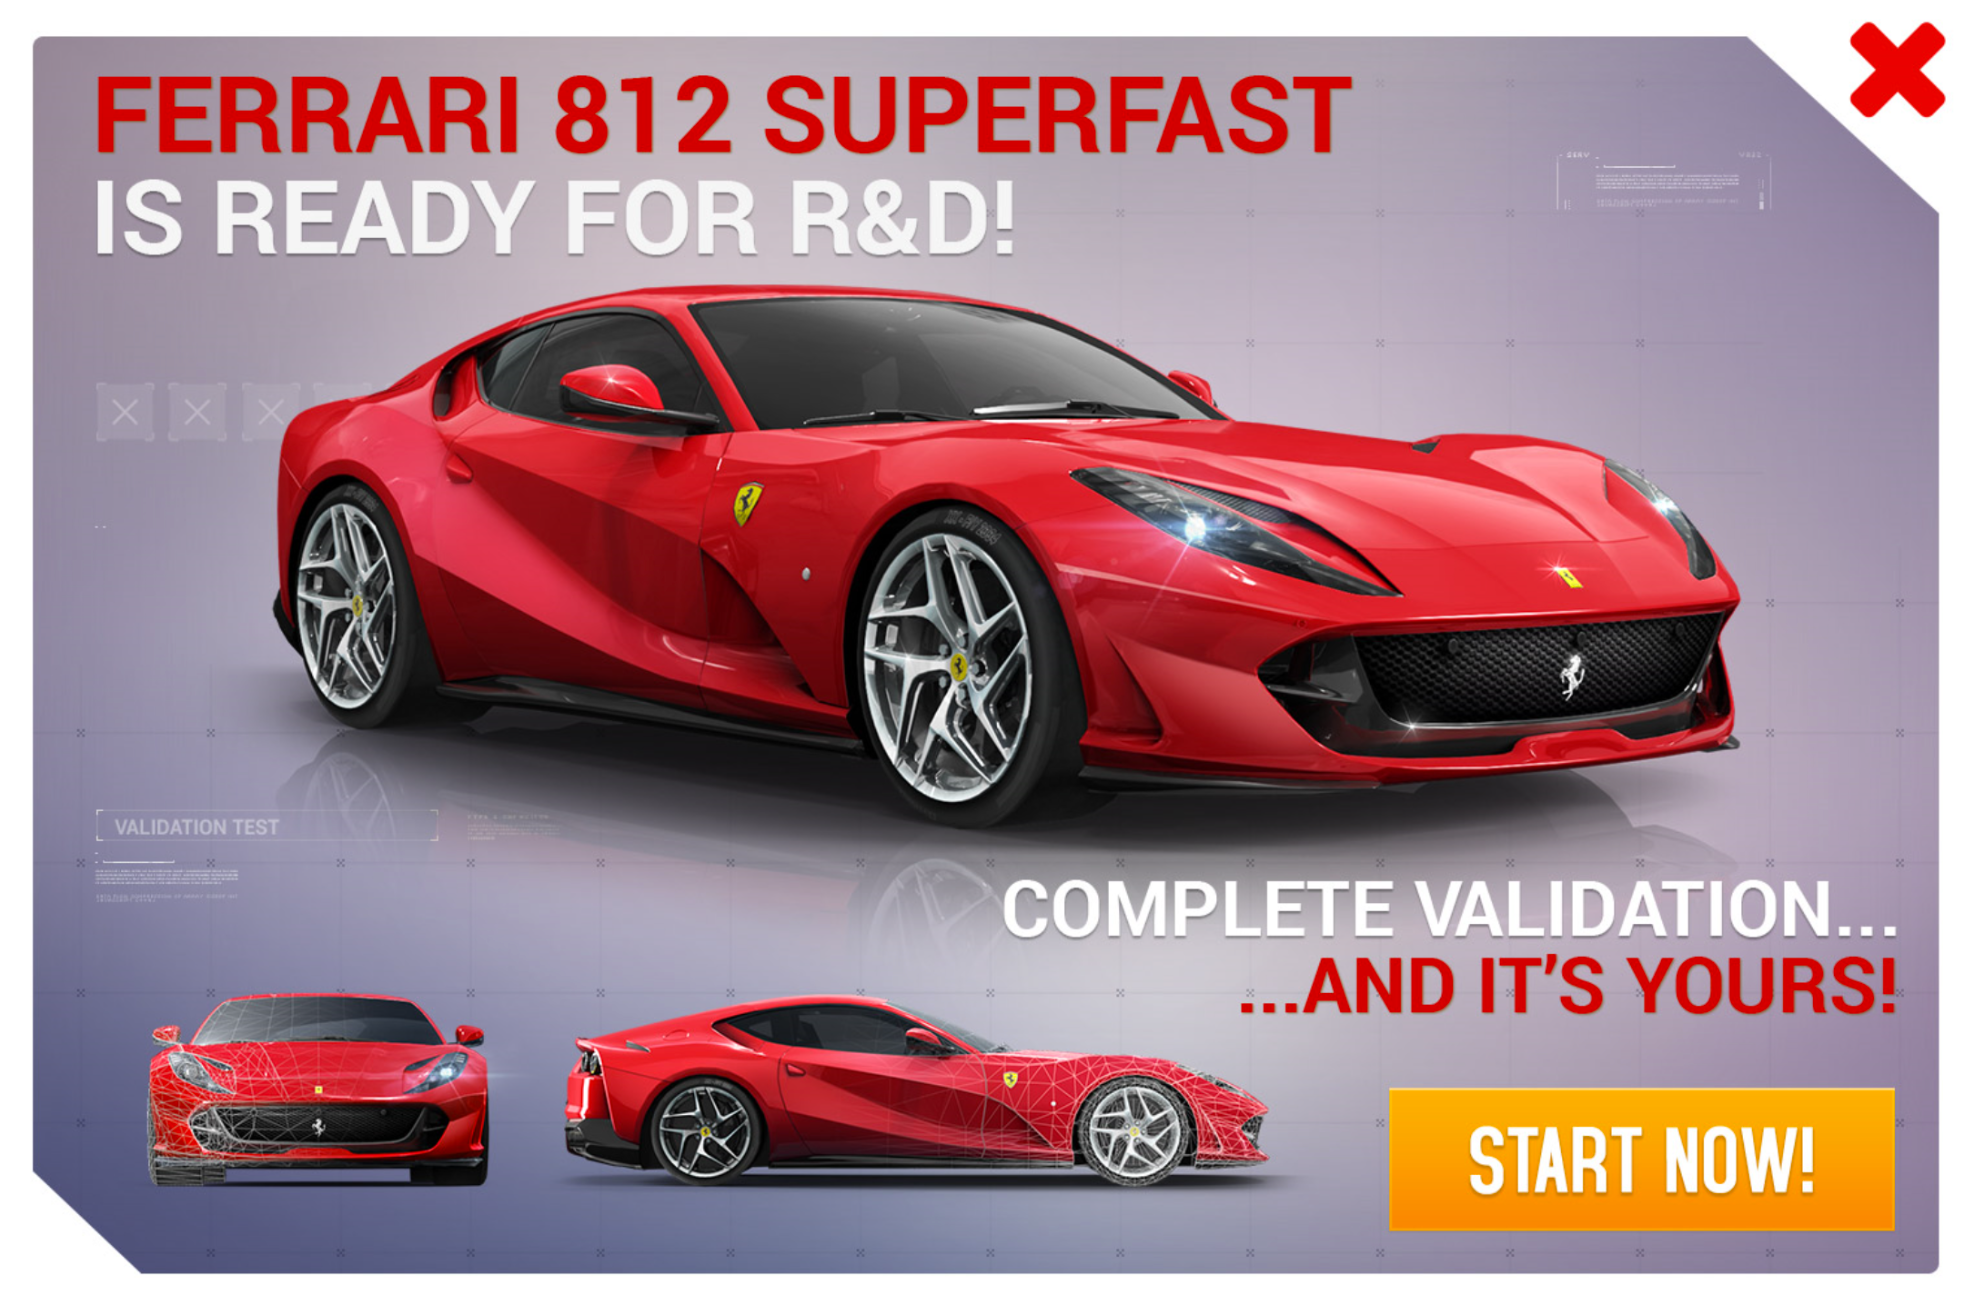 Ferrari 812 Superfast (Research & Development)